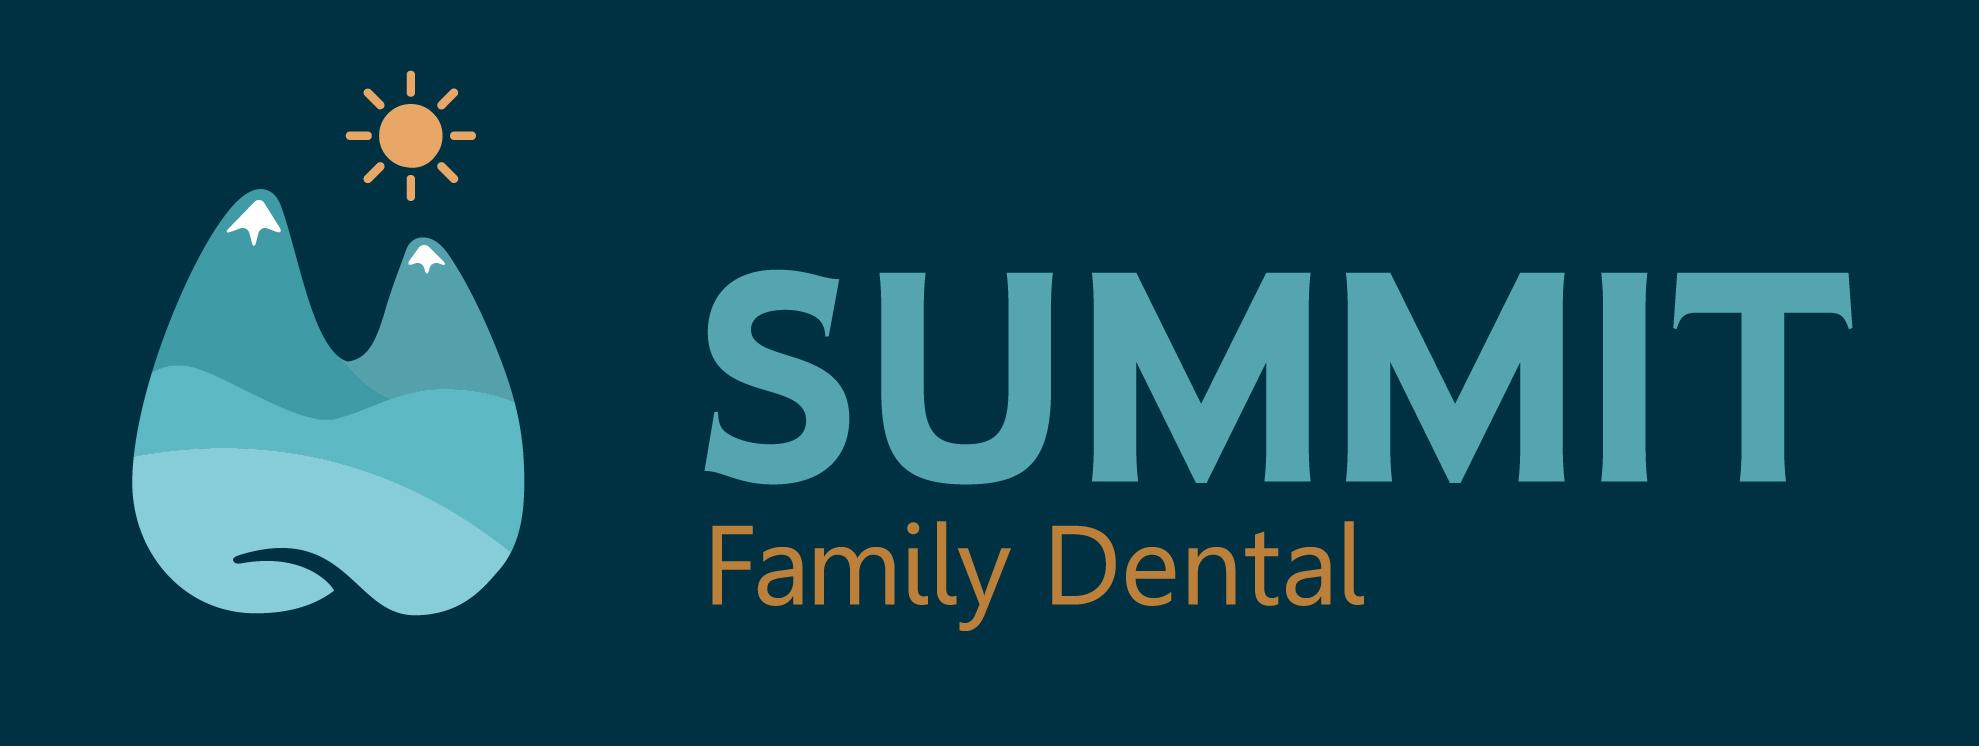 Summit Family Dental_rgb-rev_Final.jpg